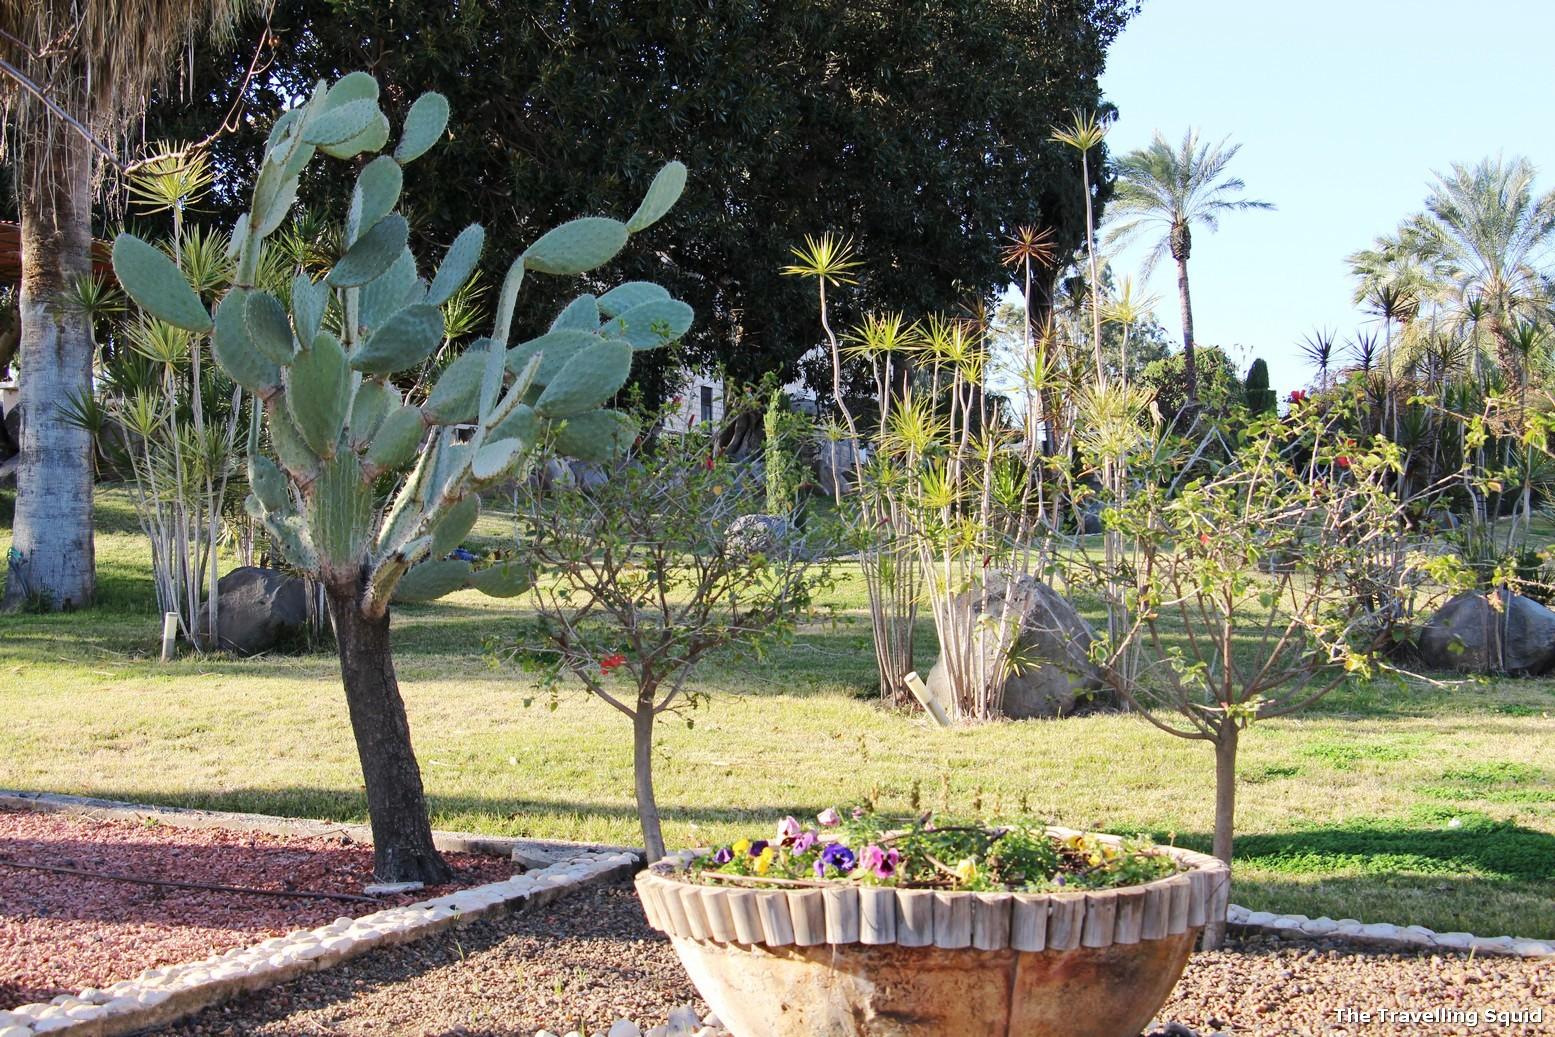 Mount of Beatitudes gardens israel